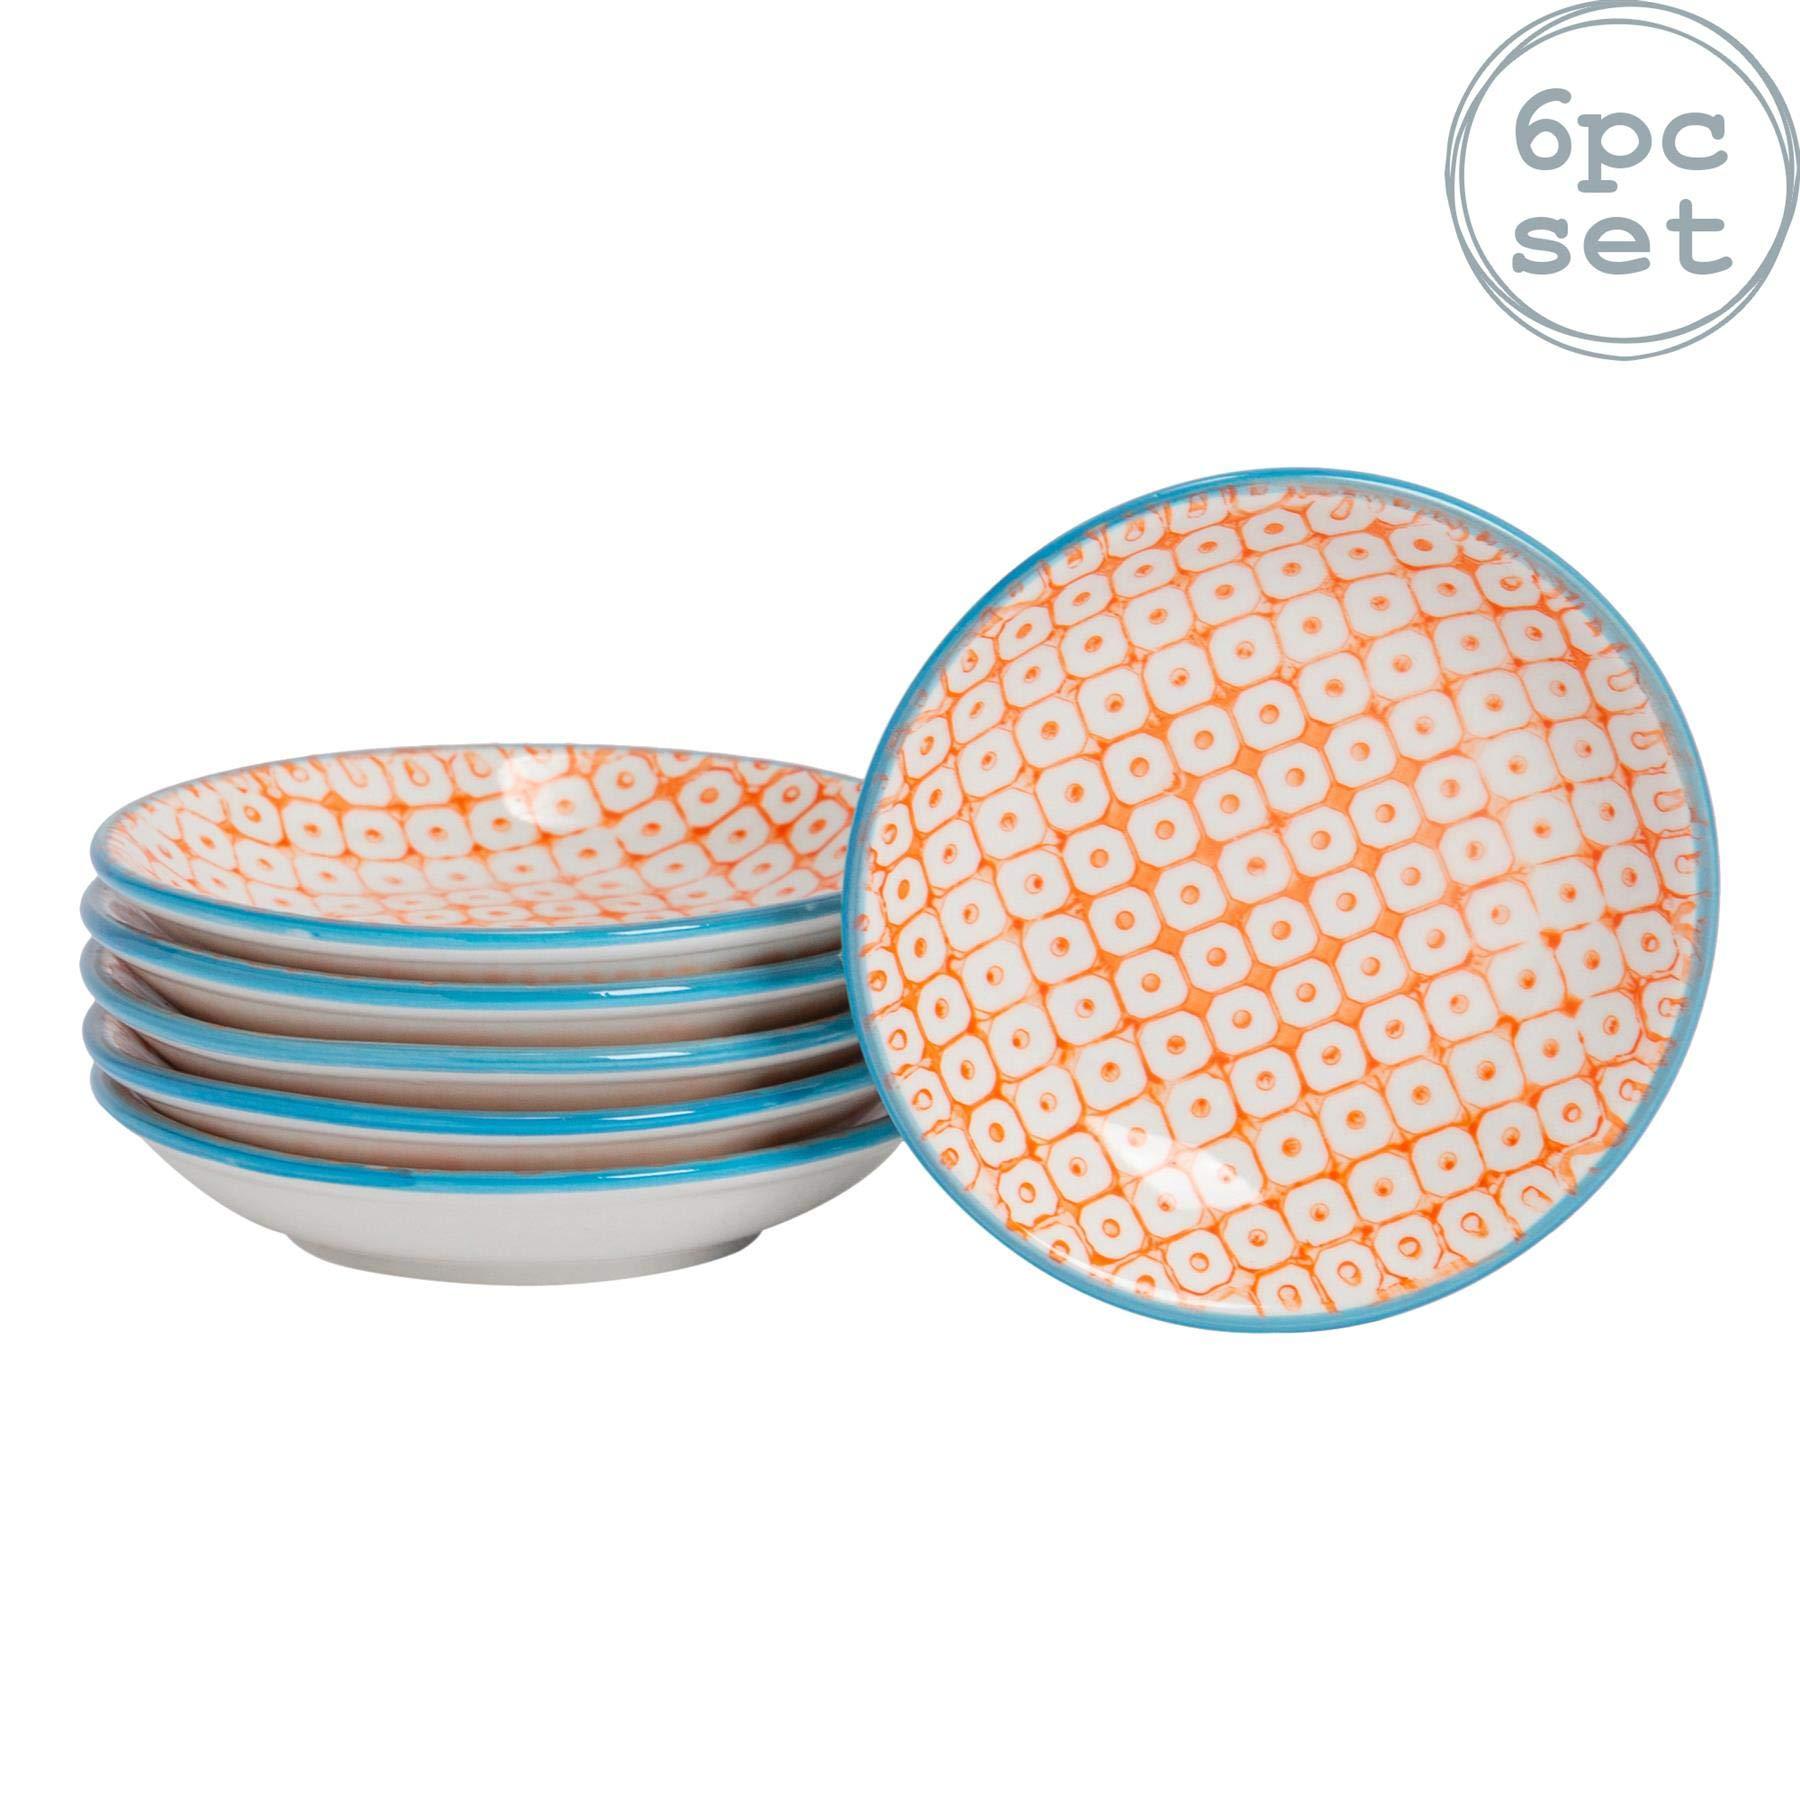 Nicola Spring 6 Piece Hand-Printed Sauce Dish Set - Small Japanese Style Porcelain Salsa Dipping Plates - Orange - 10cm